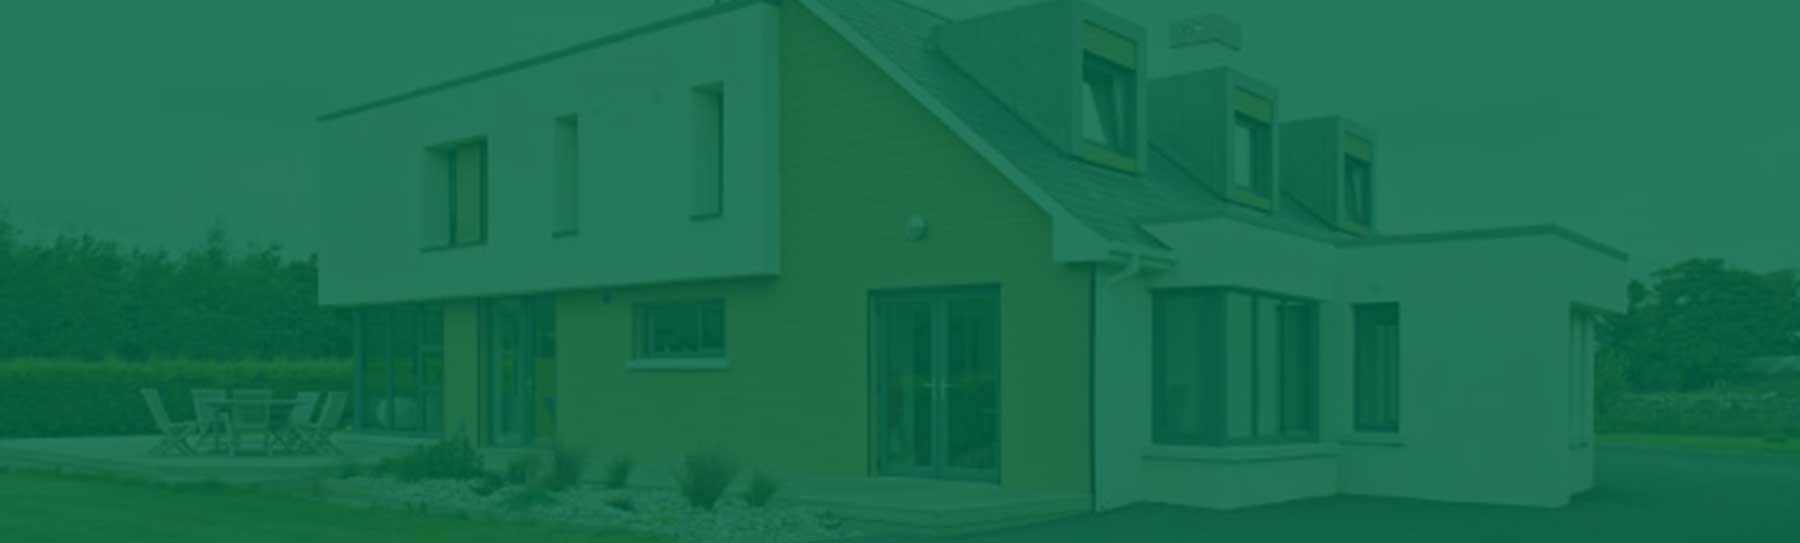 Double Glazing Prices Somerset